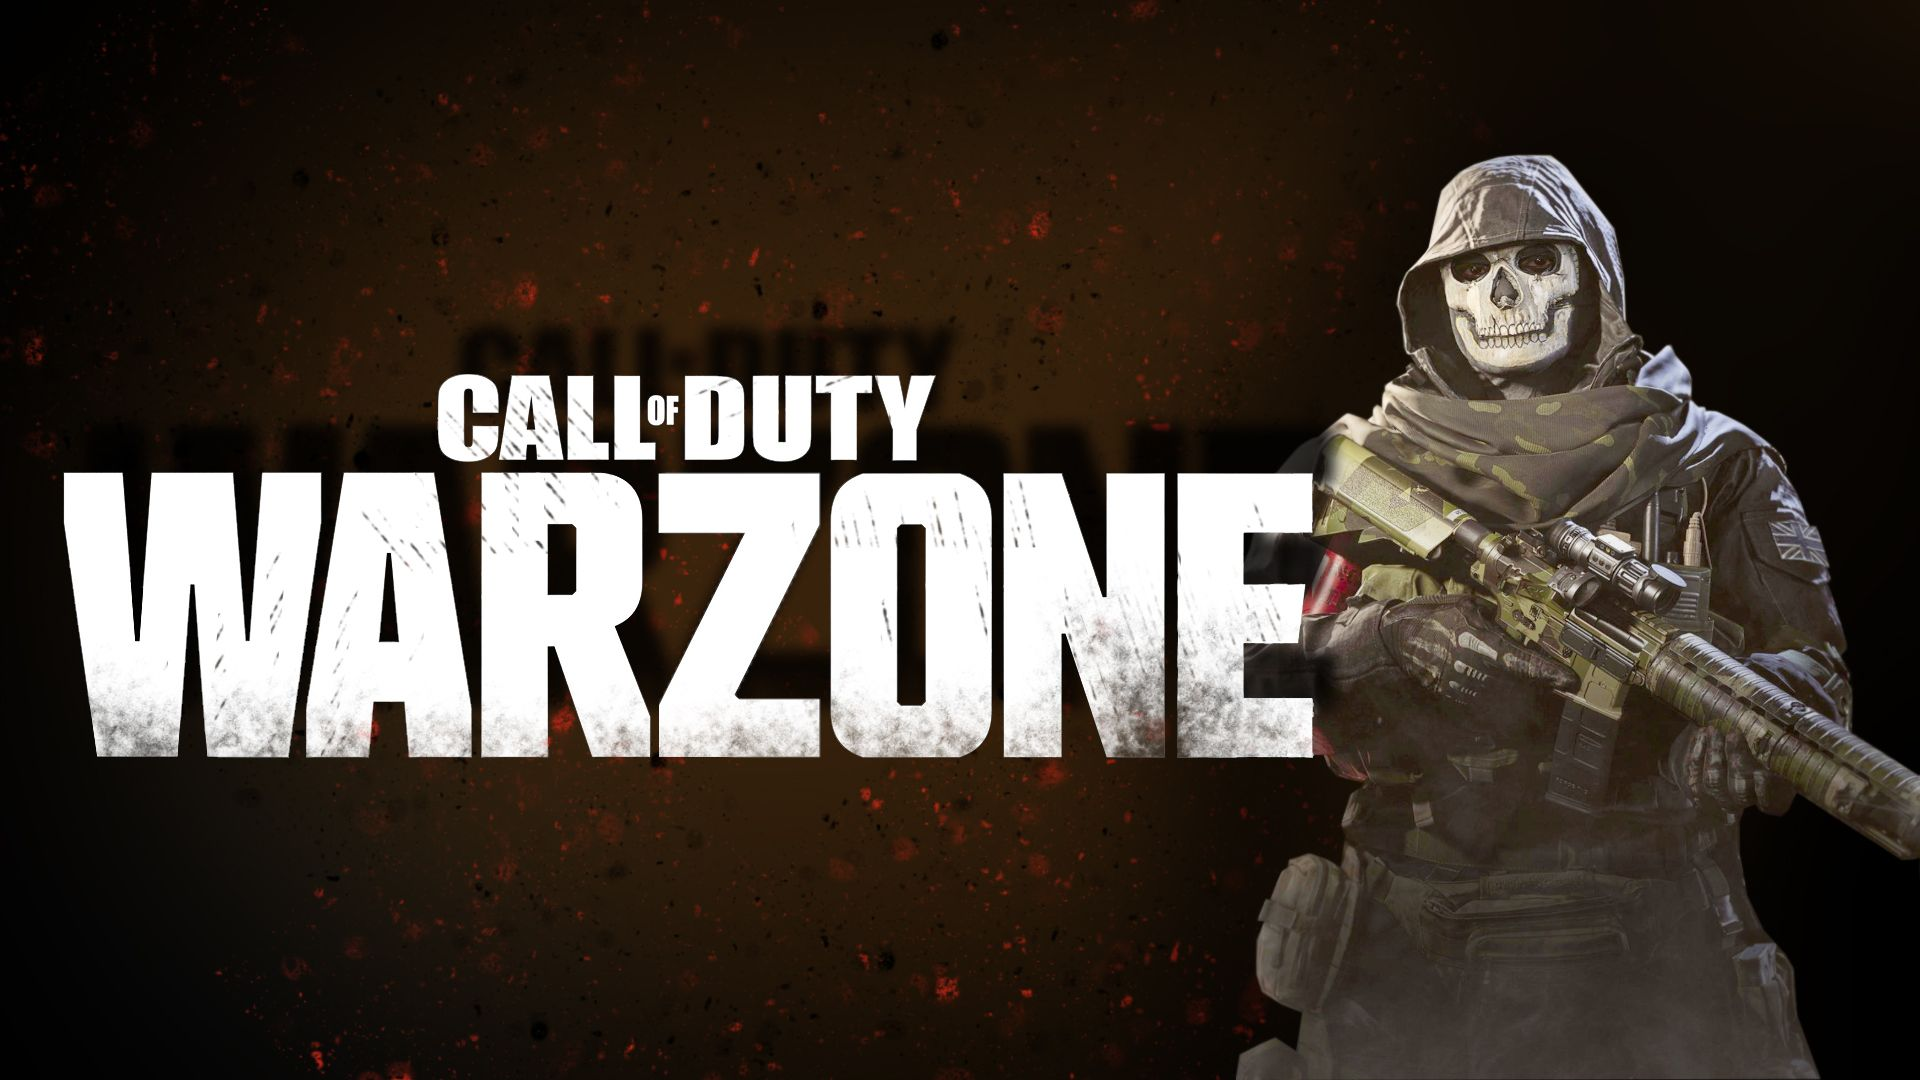 Call Of Duty Warzone Wallpaper 1920x1080 Call Of Duty Wallpaper Duties